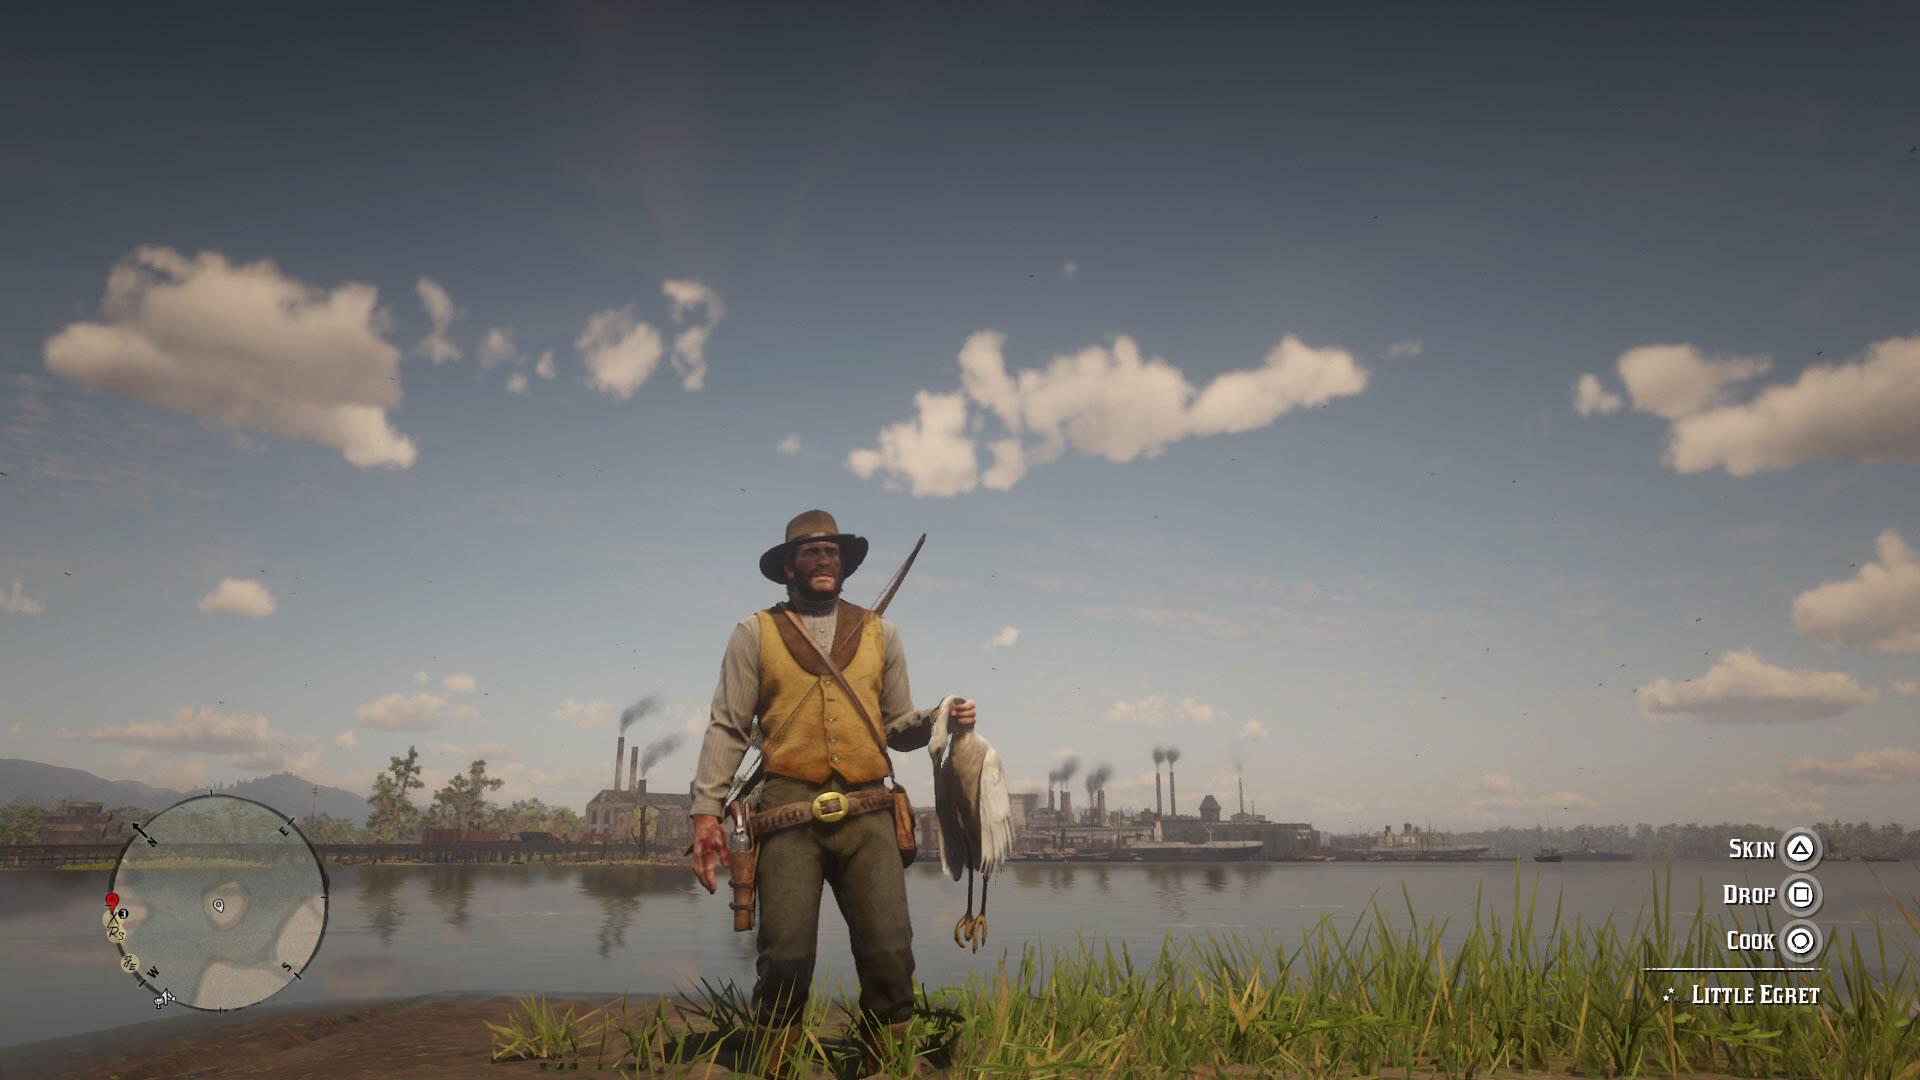 Arthur Morgan hunted a Little Egret. Image: Courtesy of Rockstar Games